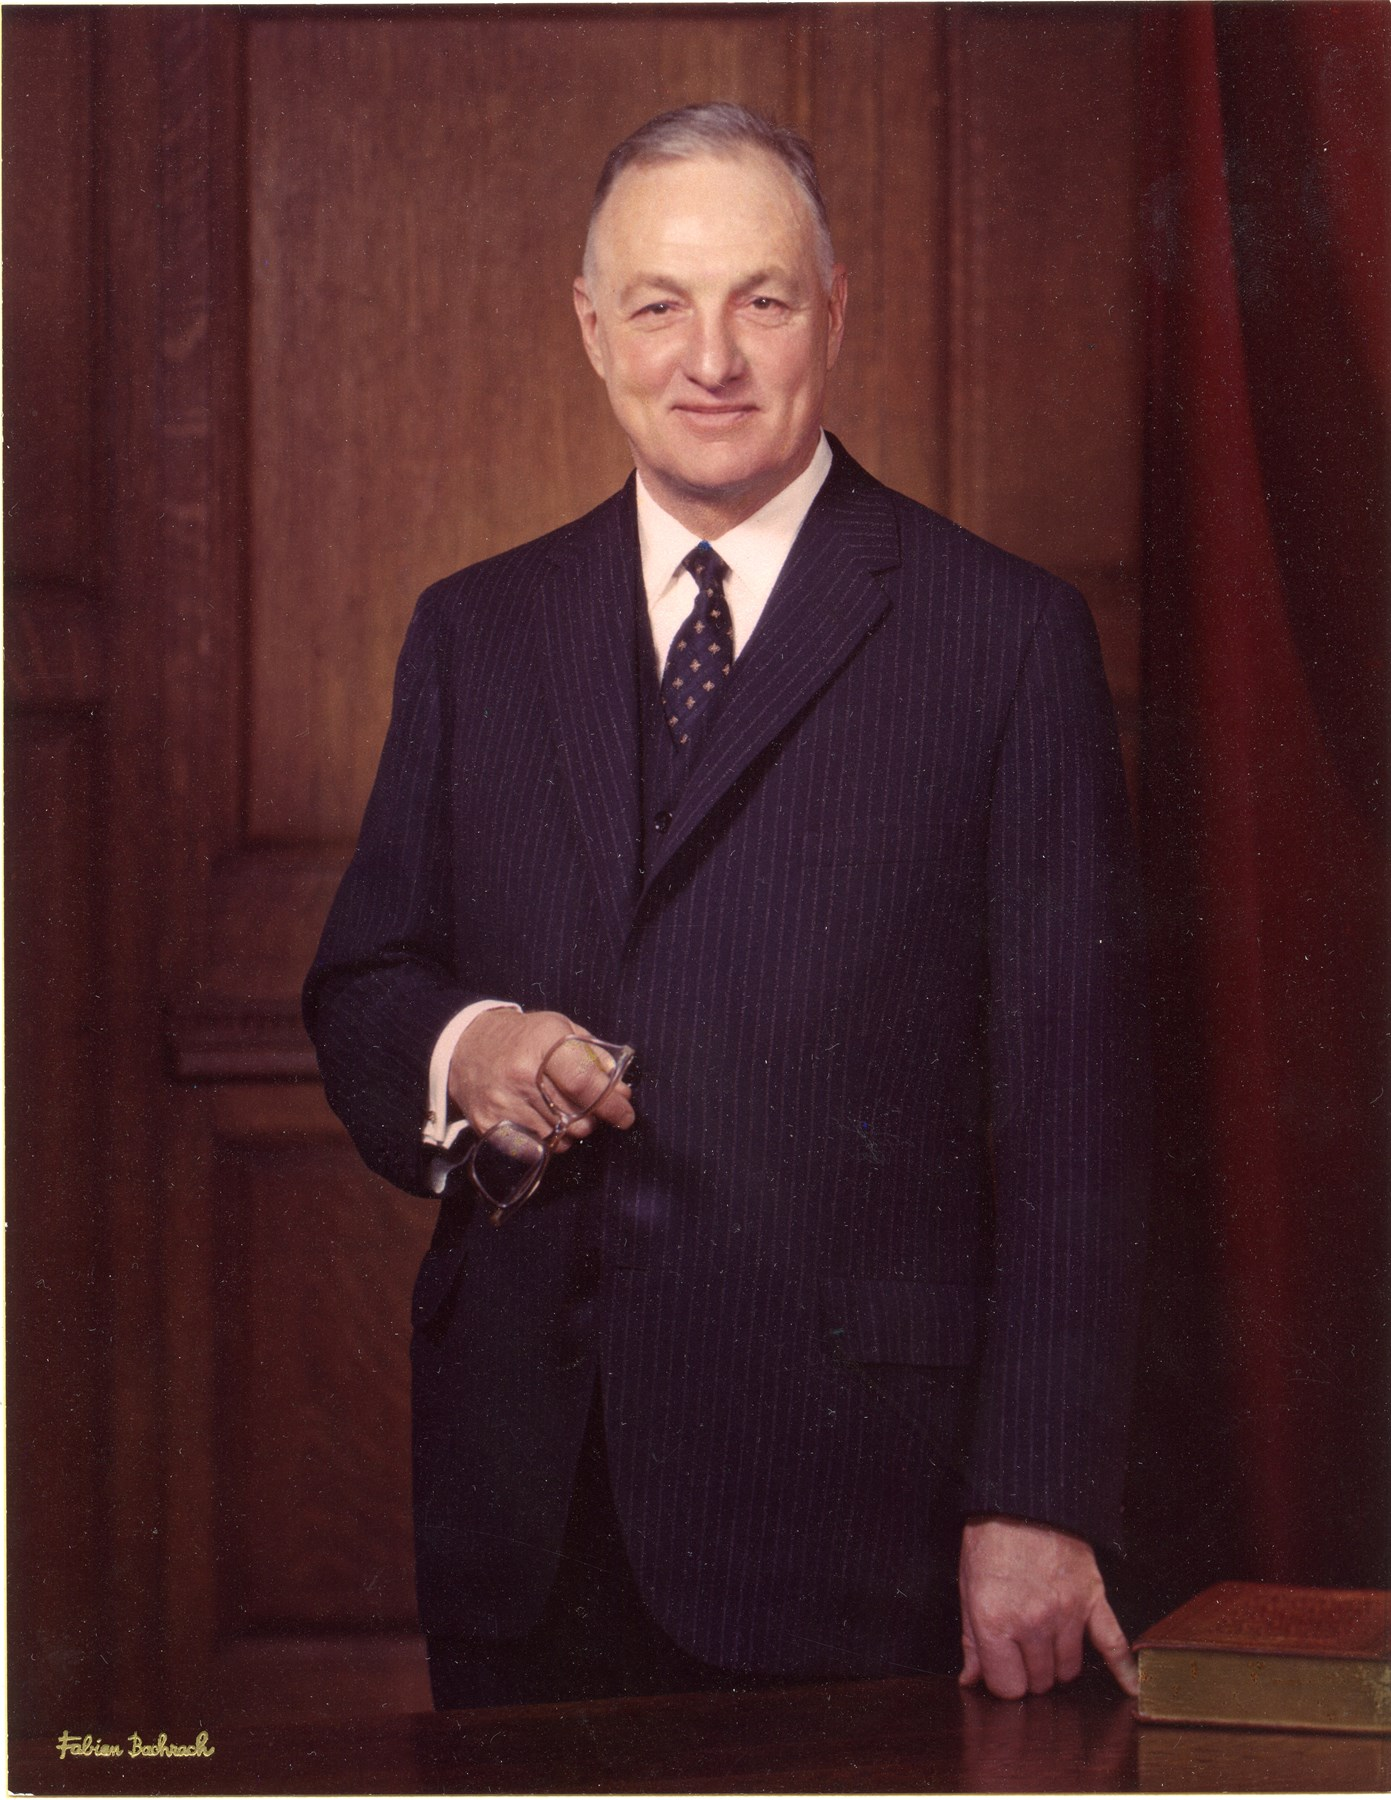 william-beinecke-new-york-ny-obituary.jpg